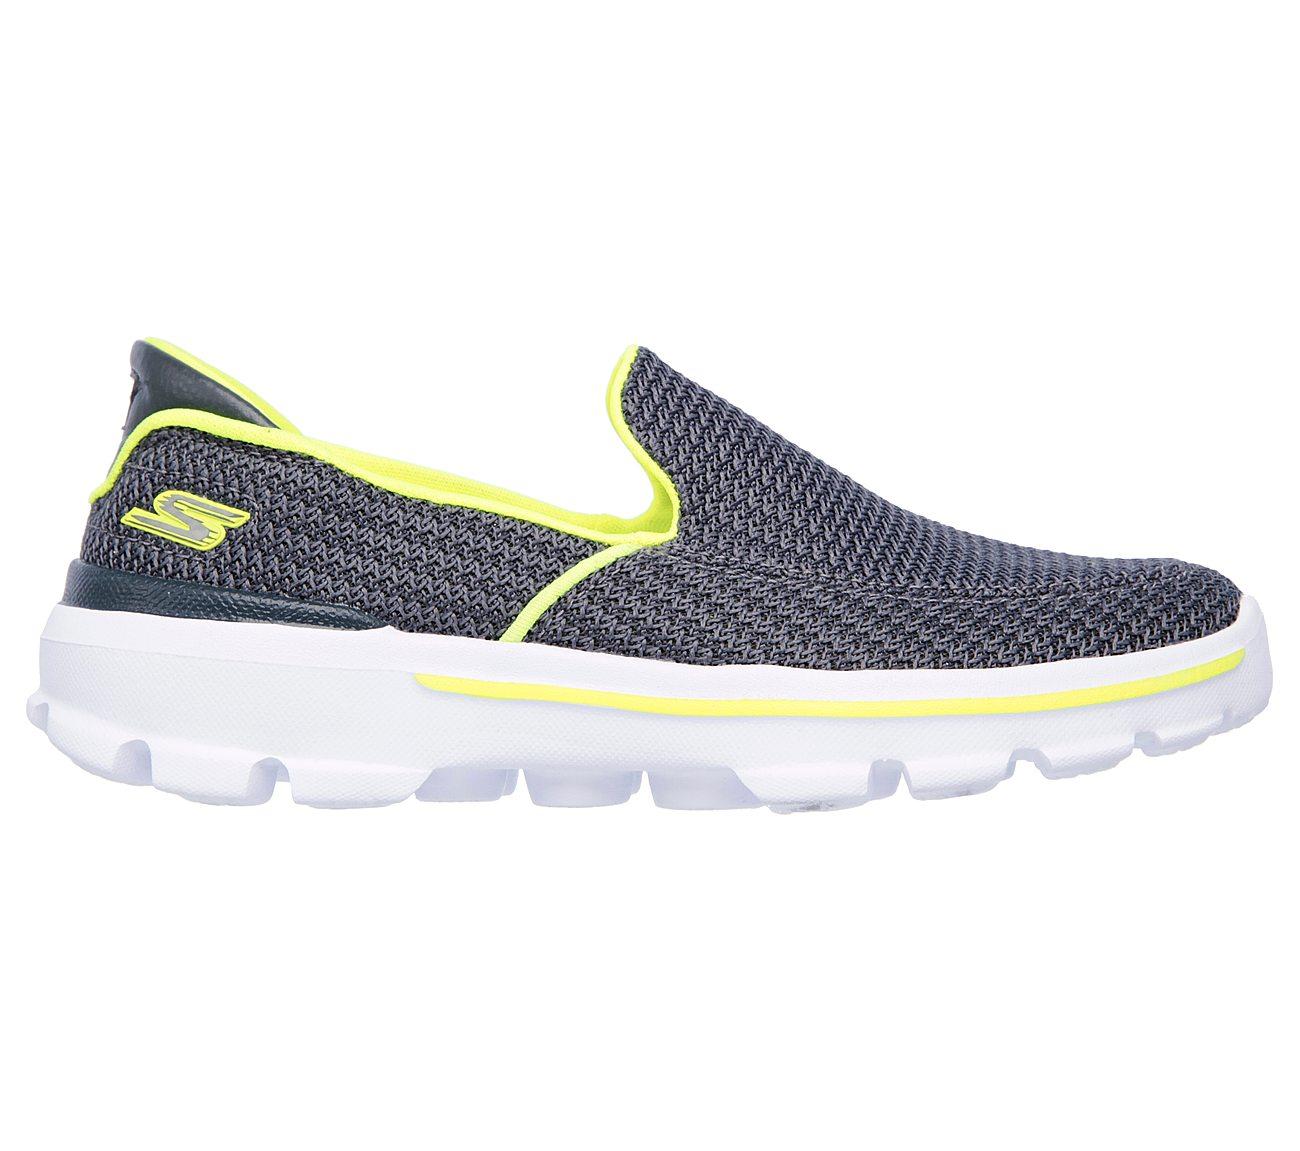 3686ec781636 Buy SKECHERS Skechers GOwalk 3 - Unruly Skechers Performance Shoes ...